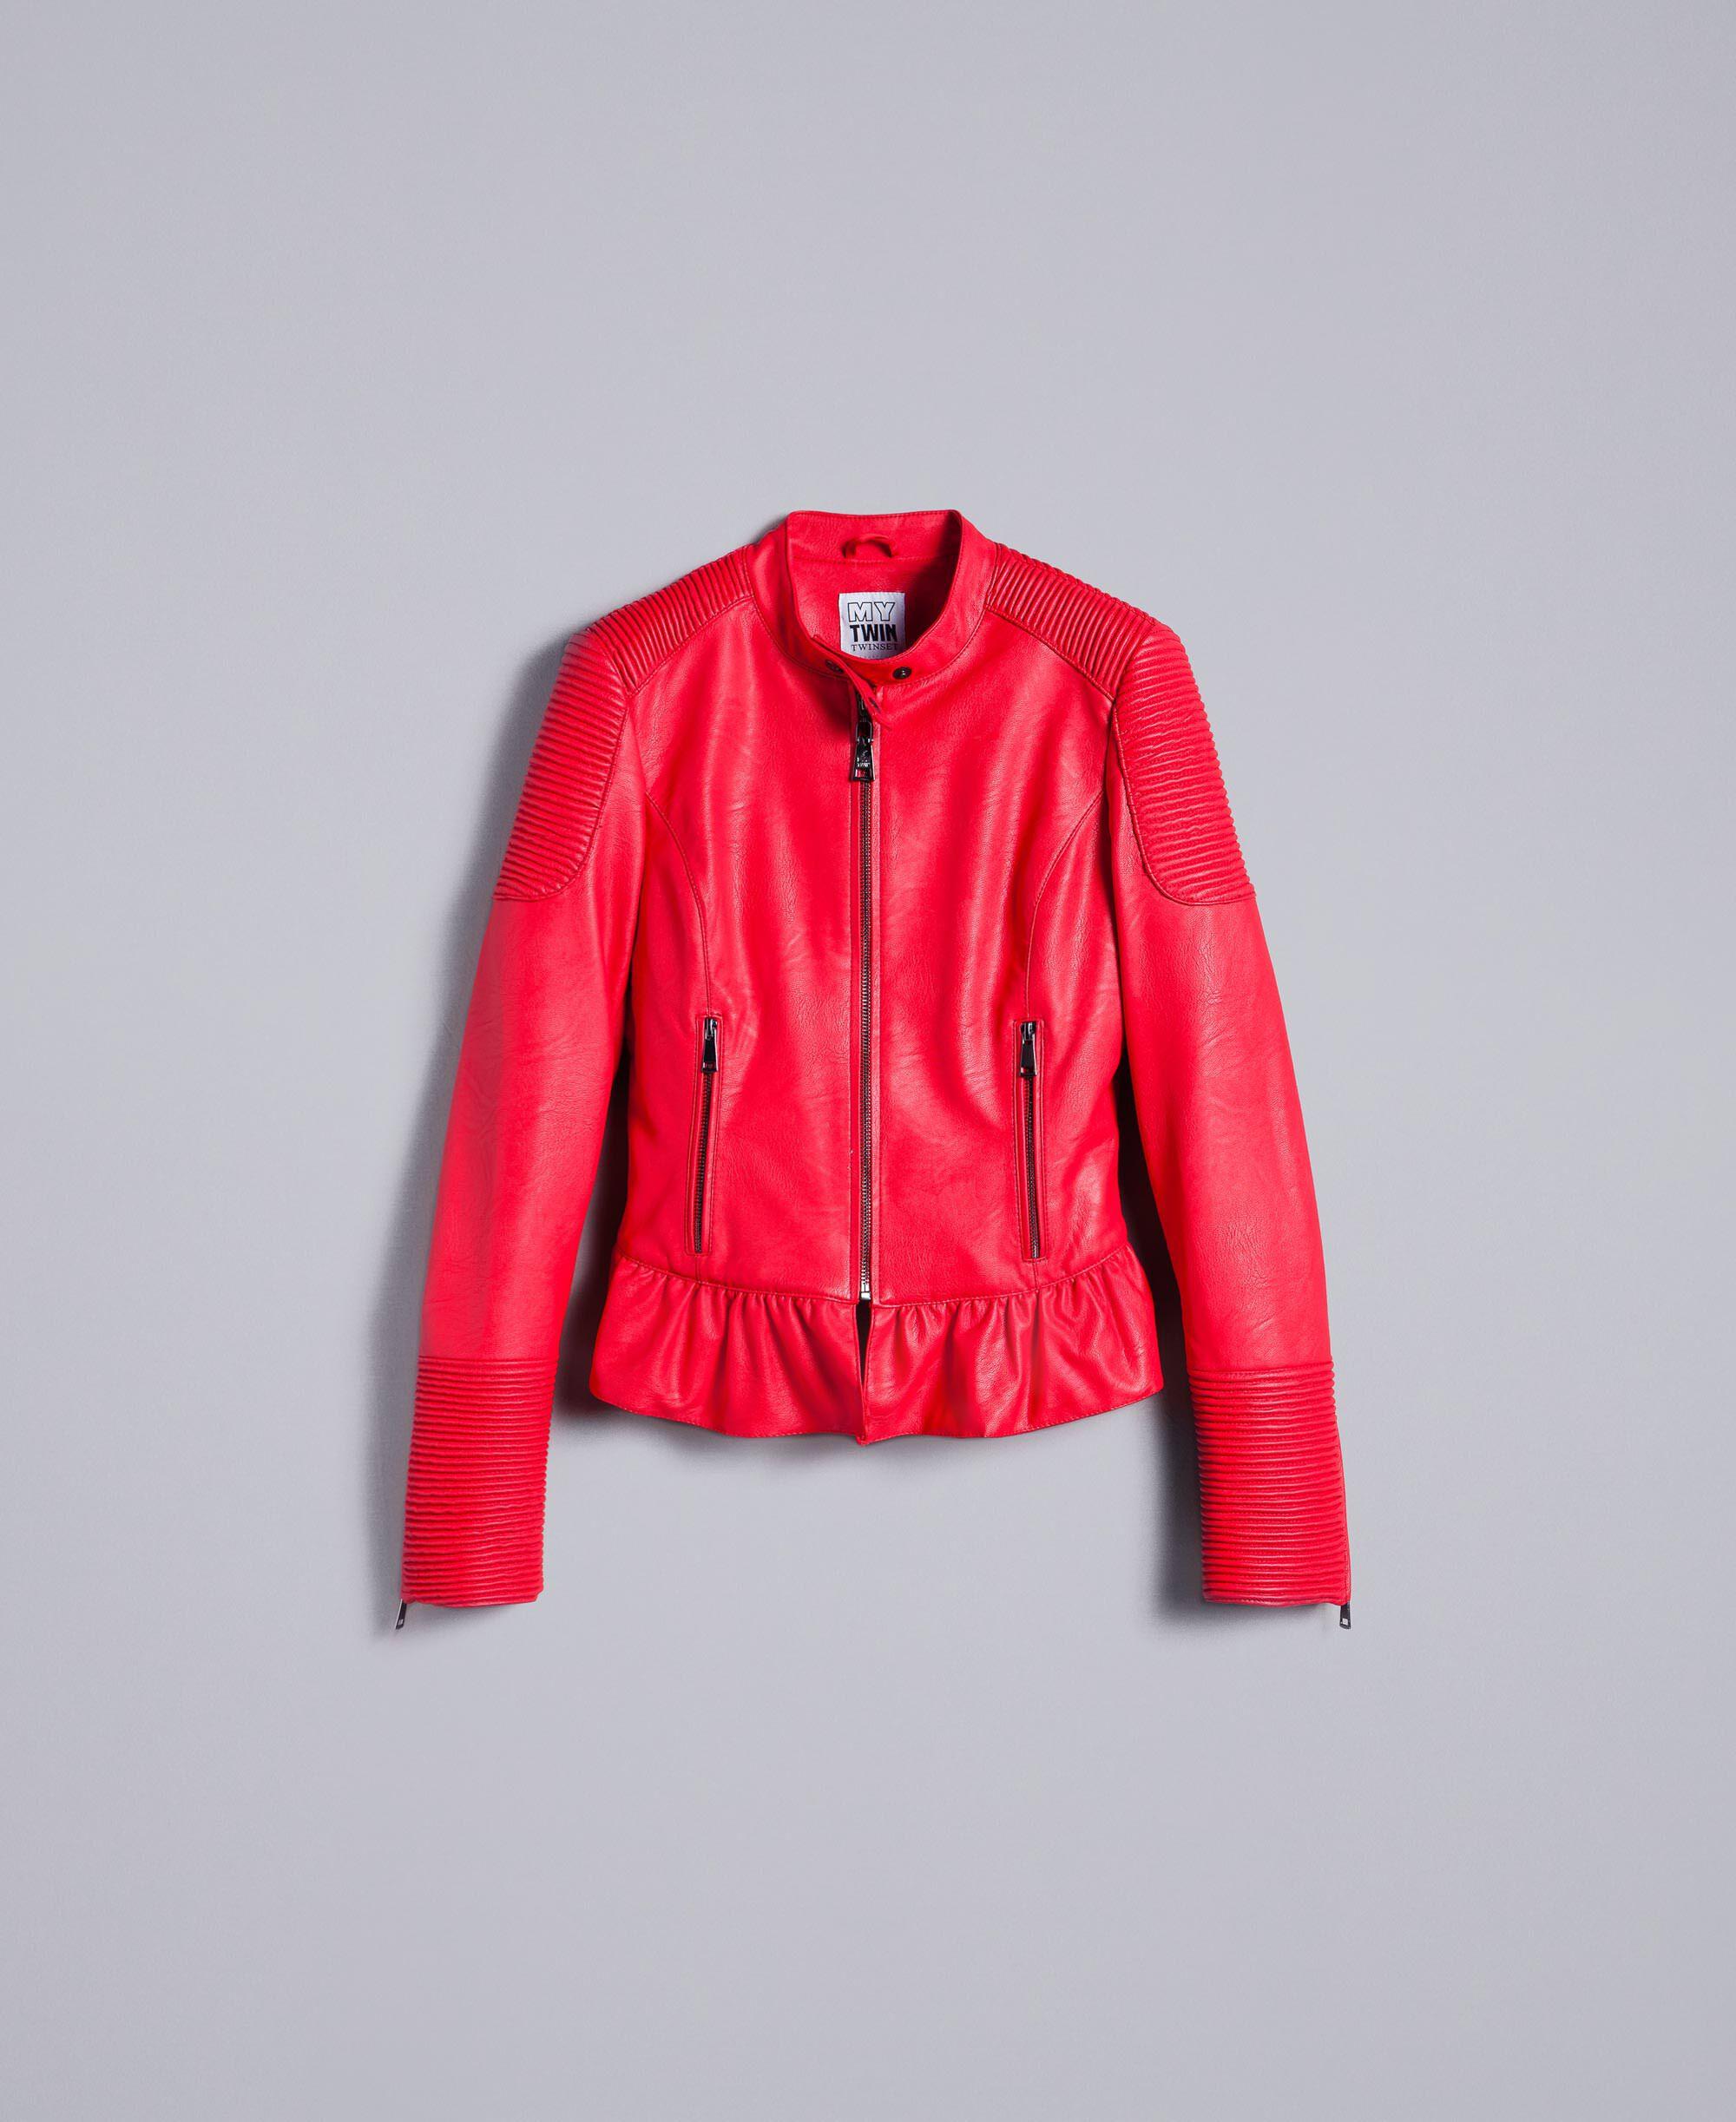 Lavage veste en simili cuir